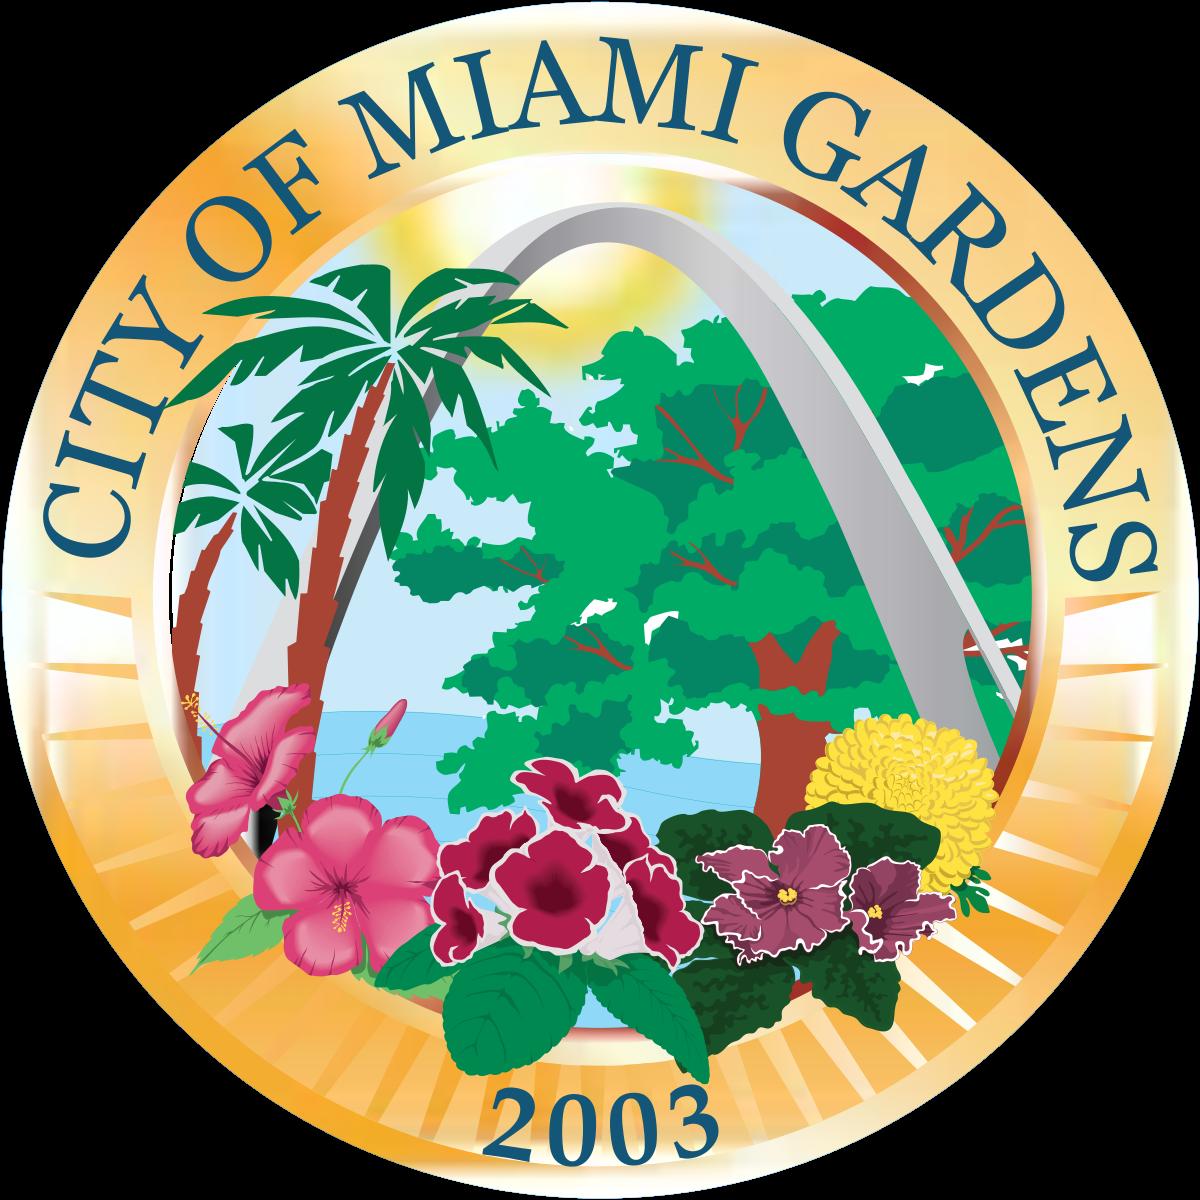 city of miami gardens logo